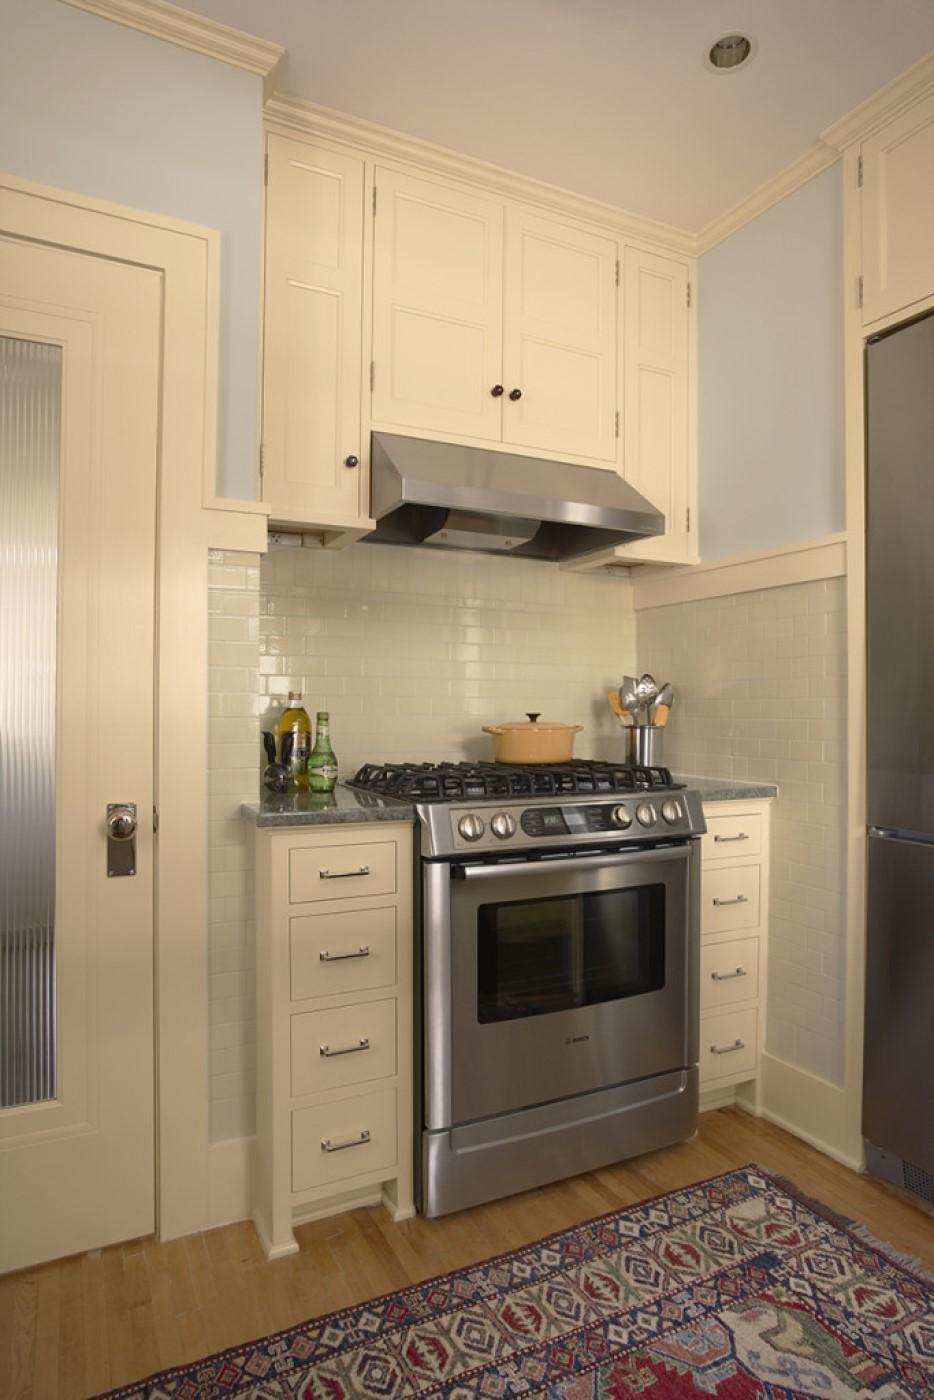 Kitchen stainless steel stove and very light gray tile backsplash